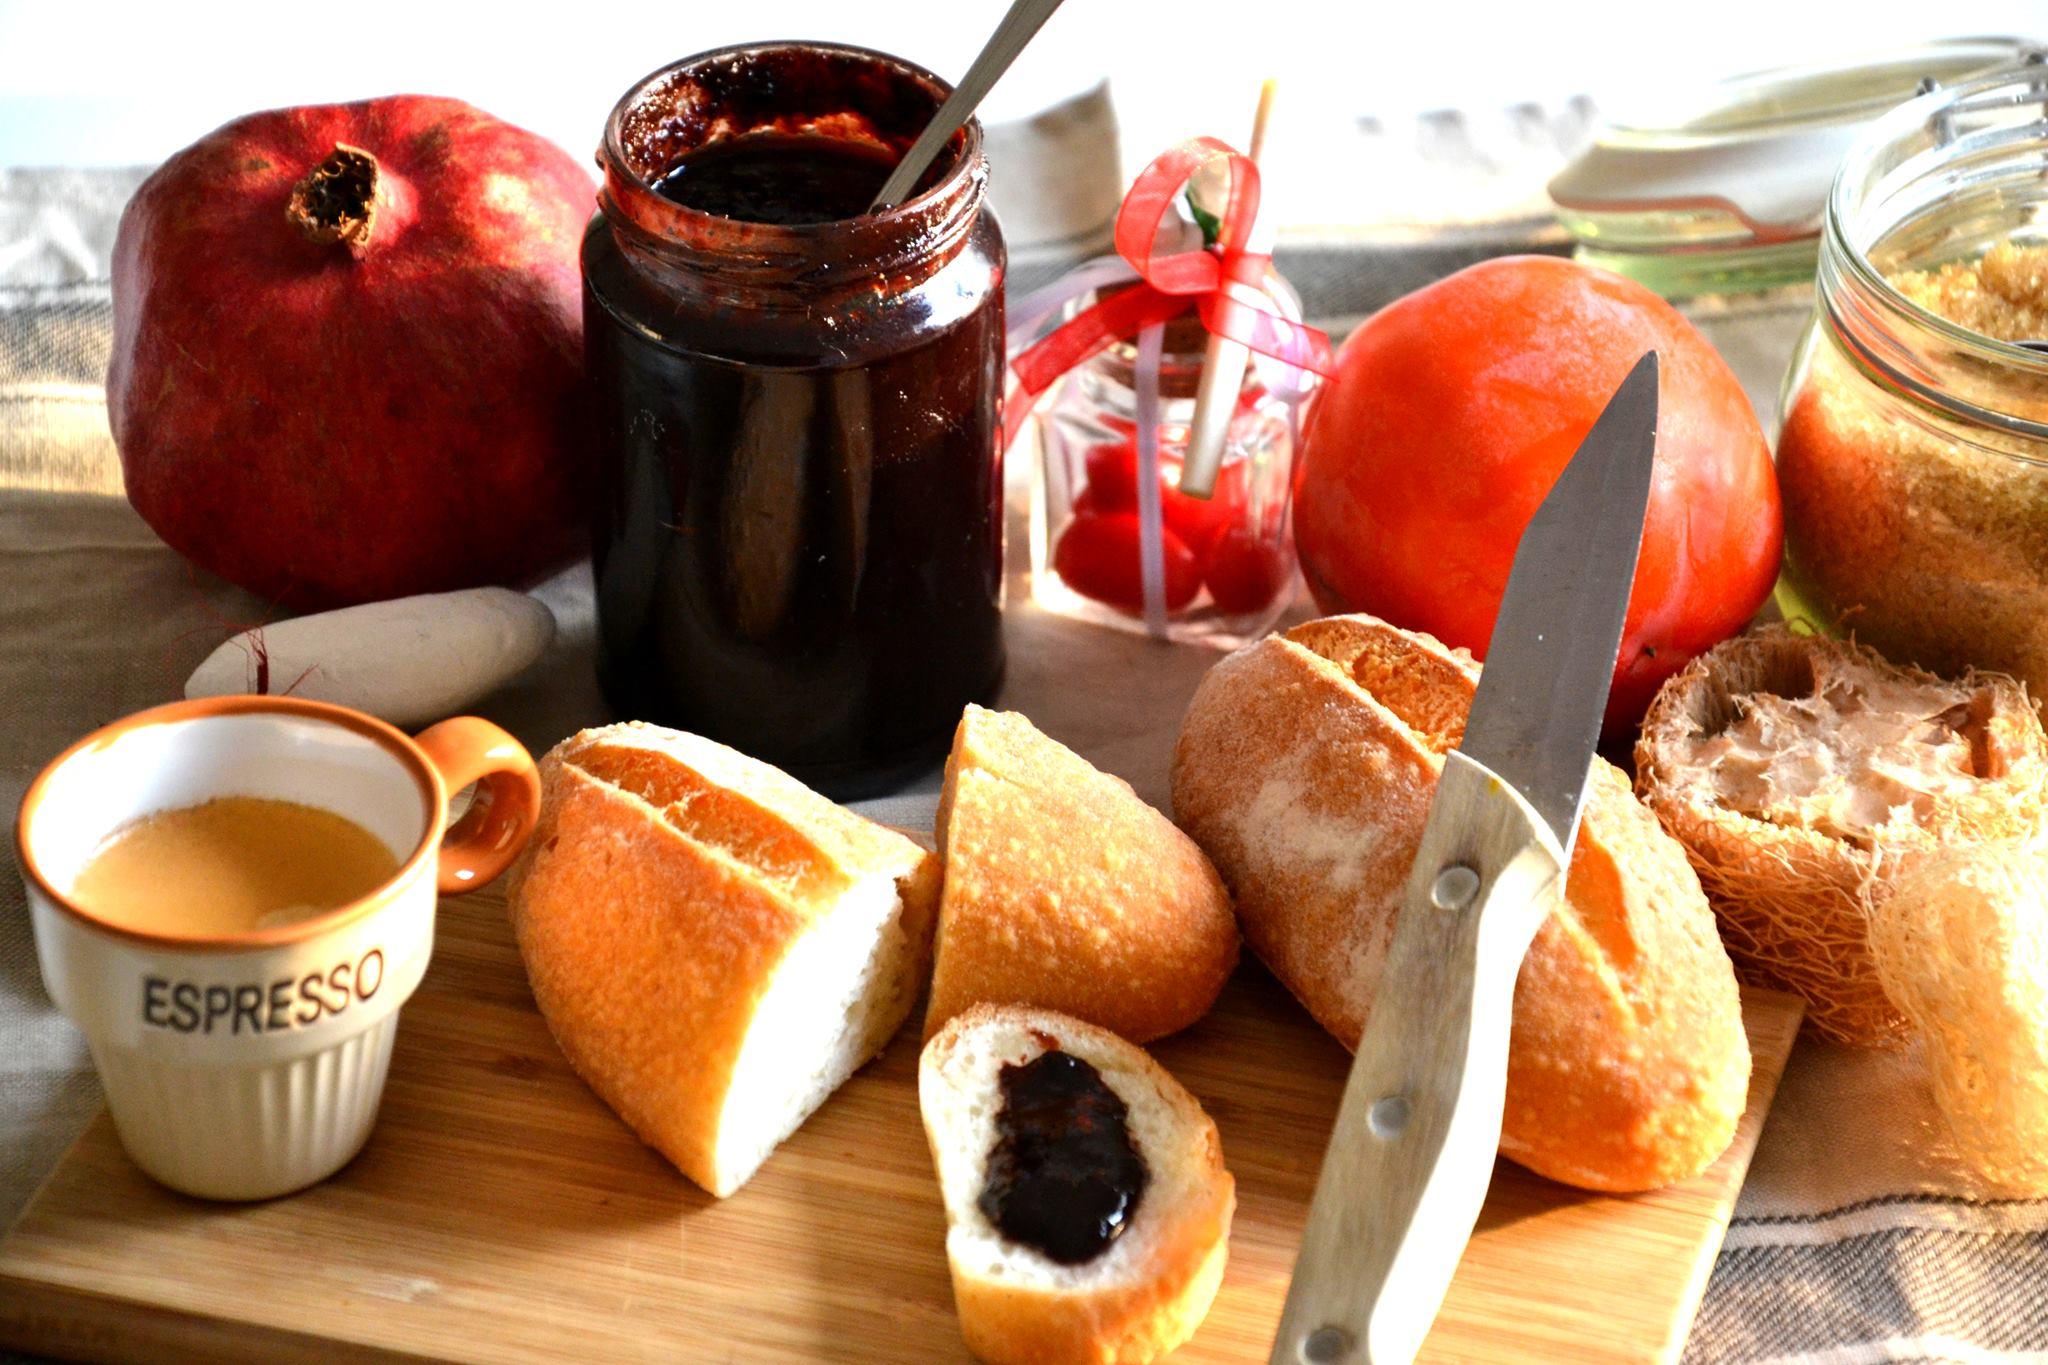 Home-made breakfast, naturalmente senza glutine! Gluten Free Travel and Living